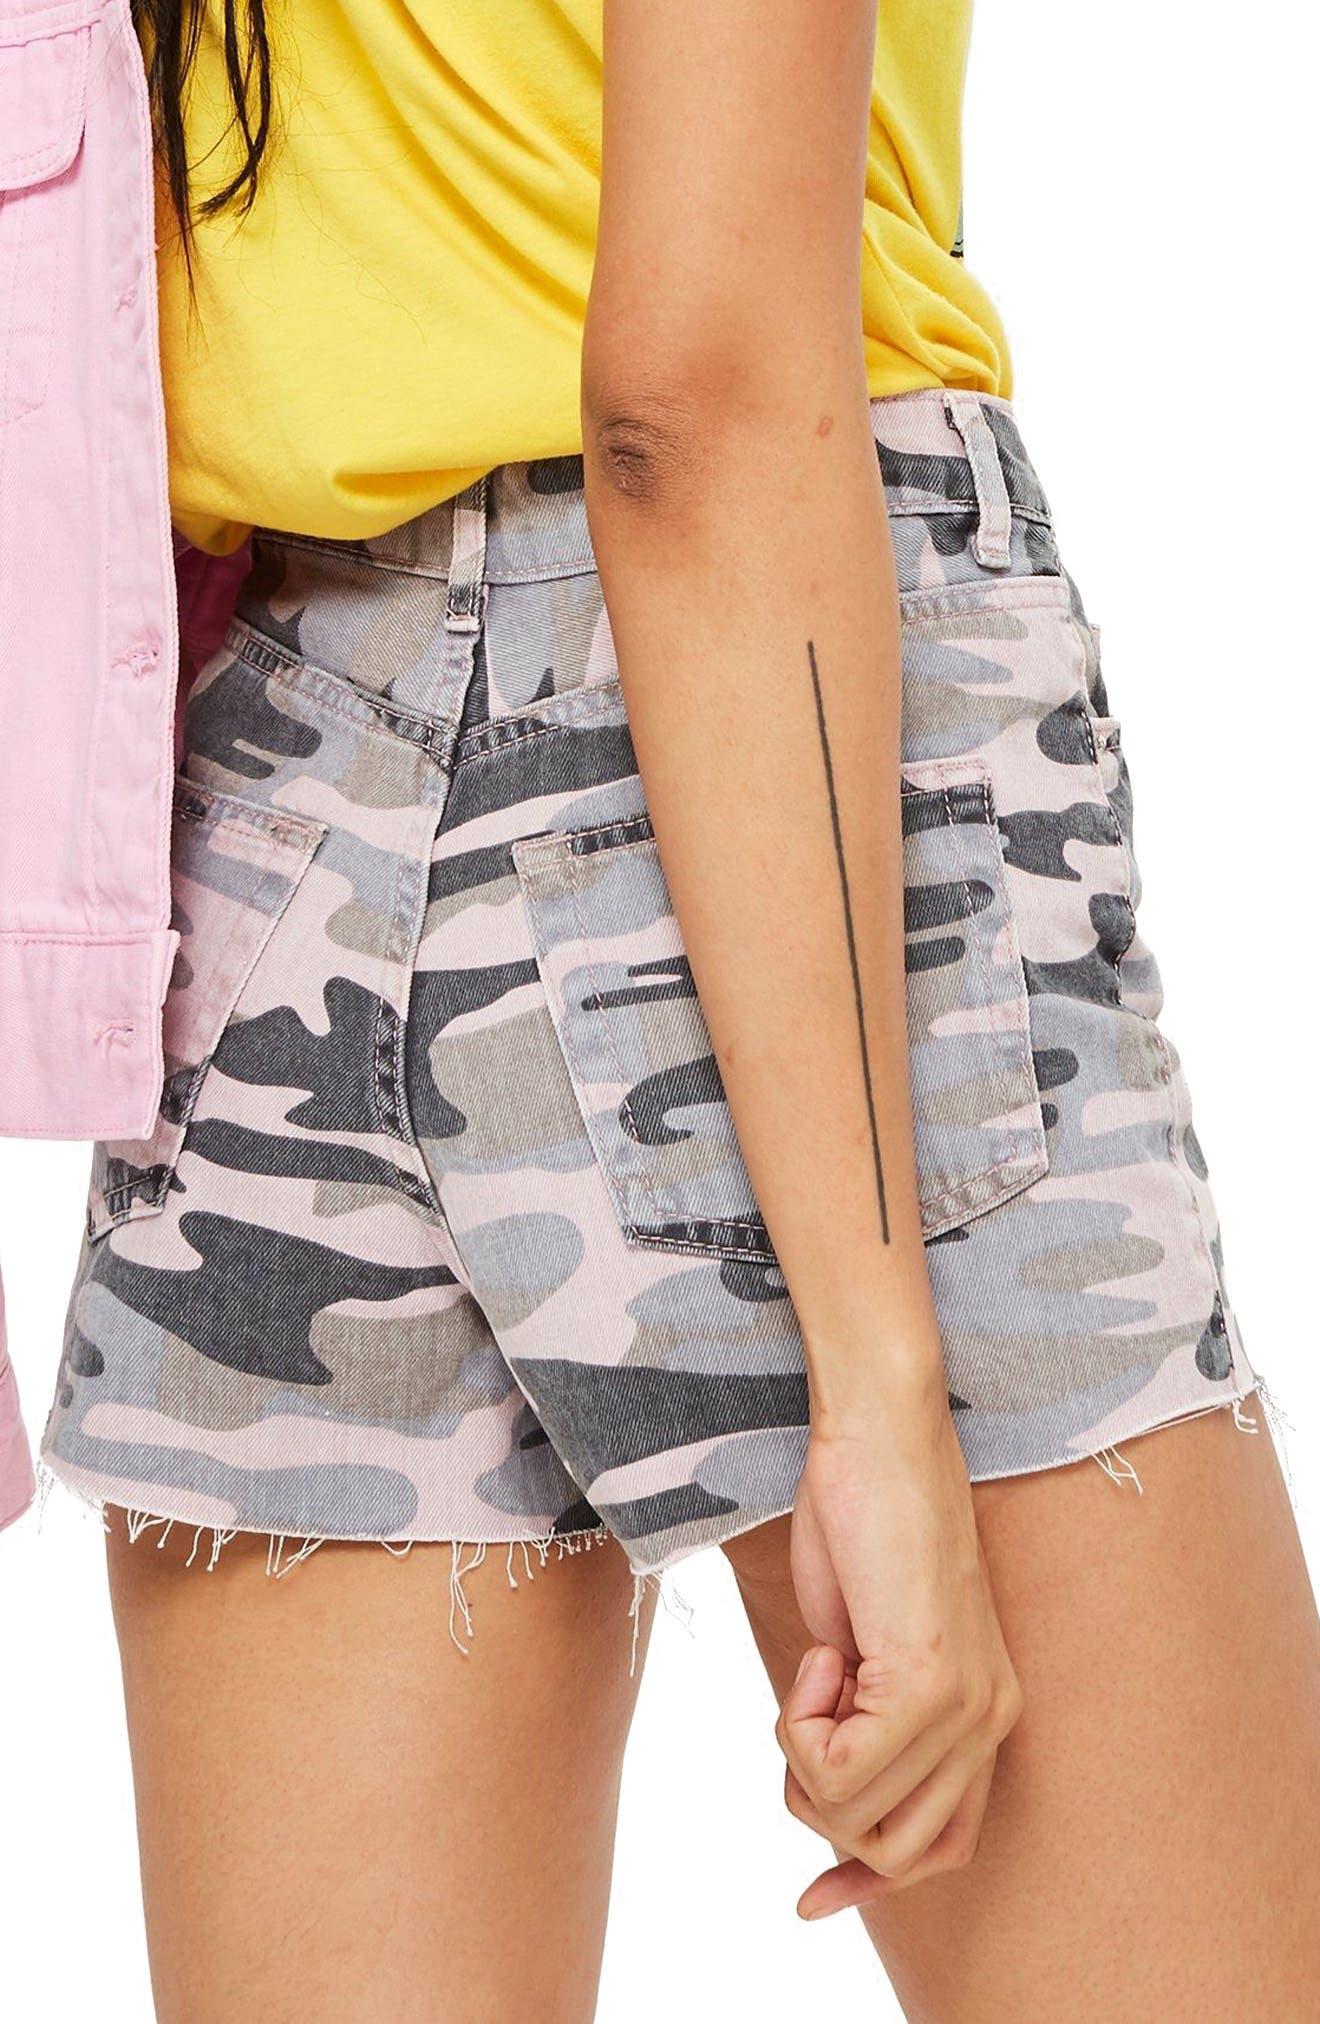 MOTO Fray Hem High Waist Shorts,                             Alternate thumbnail 2, color,                             PINK MULTI